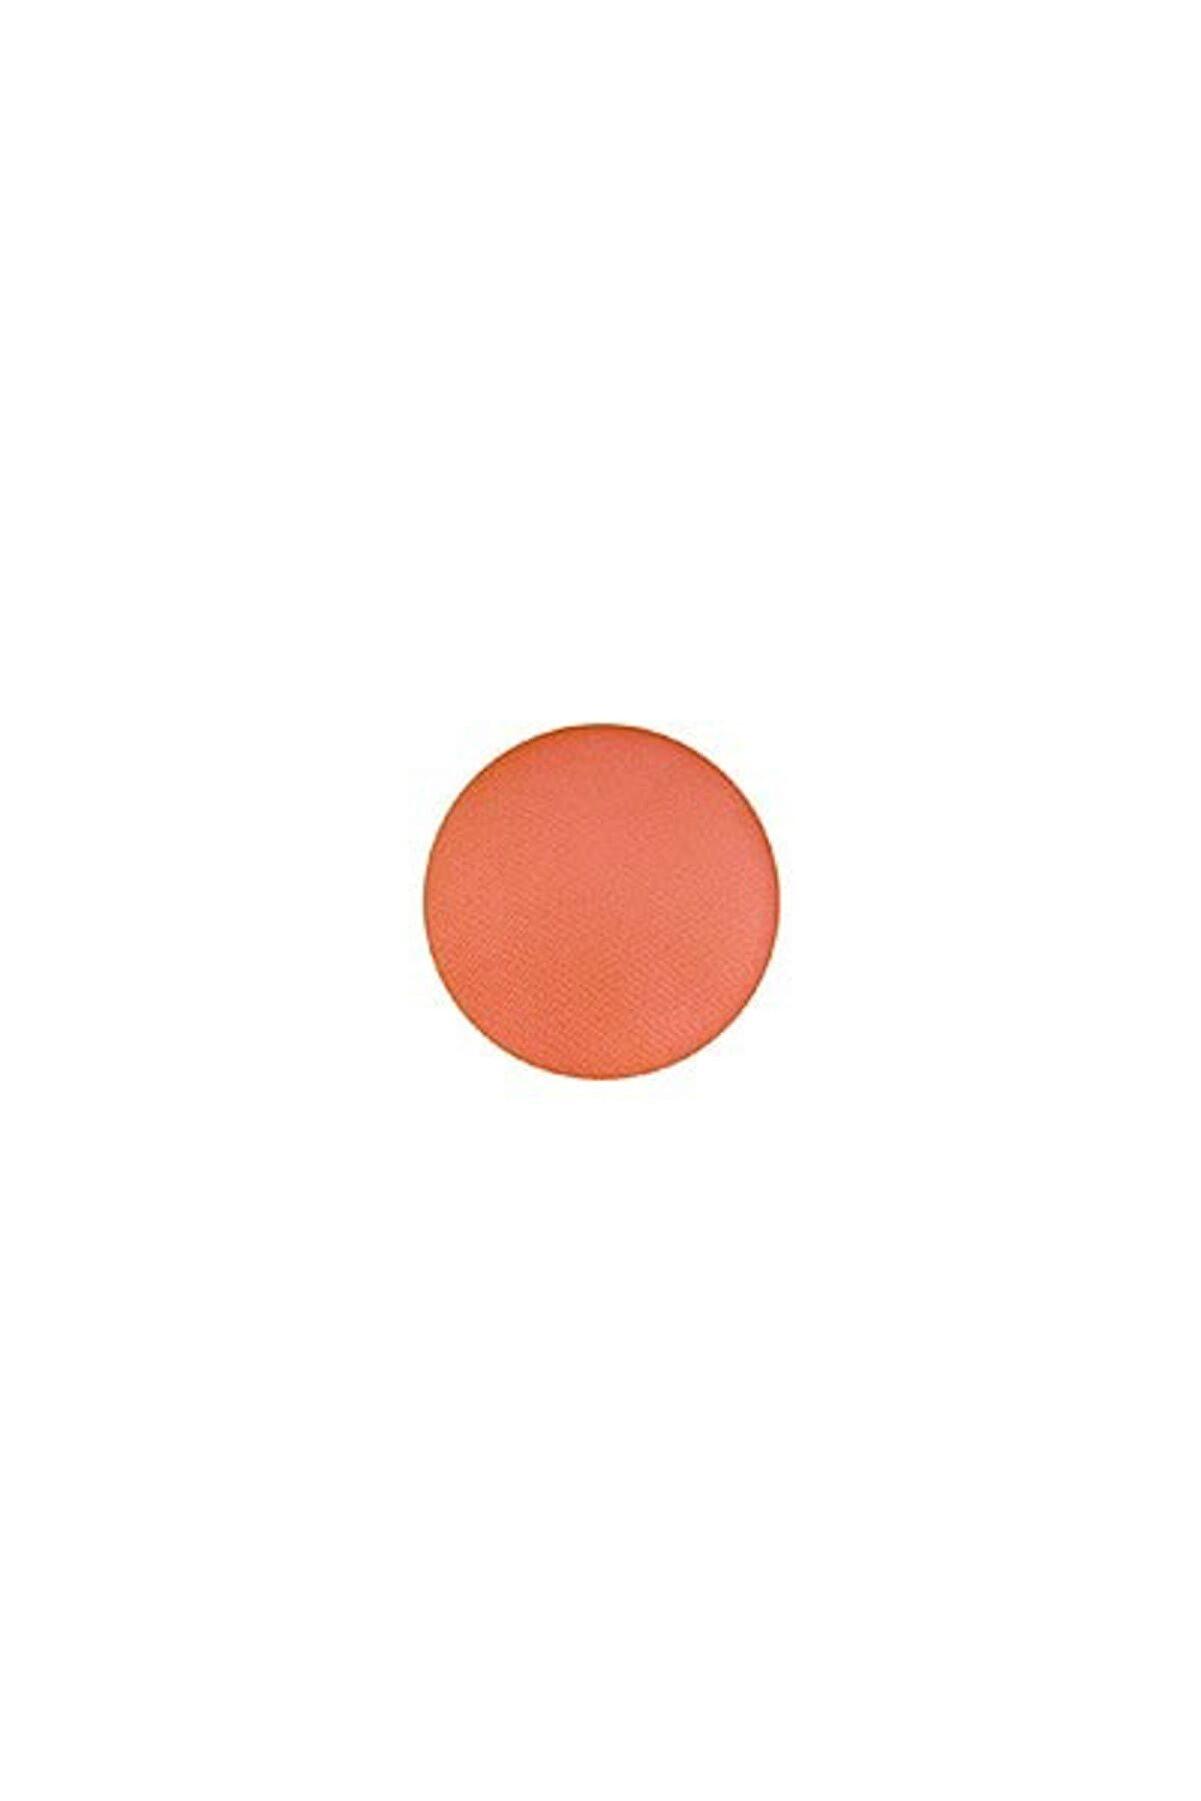 Mac Refill Allık - Powder Blush Pro Palette Refill Pan Loudspeaker 6 g 773602475032